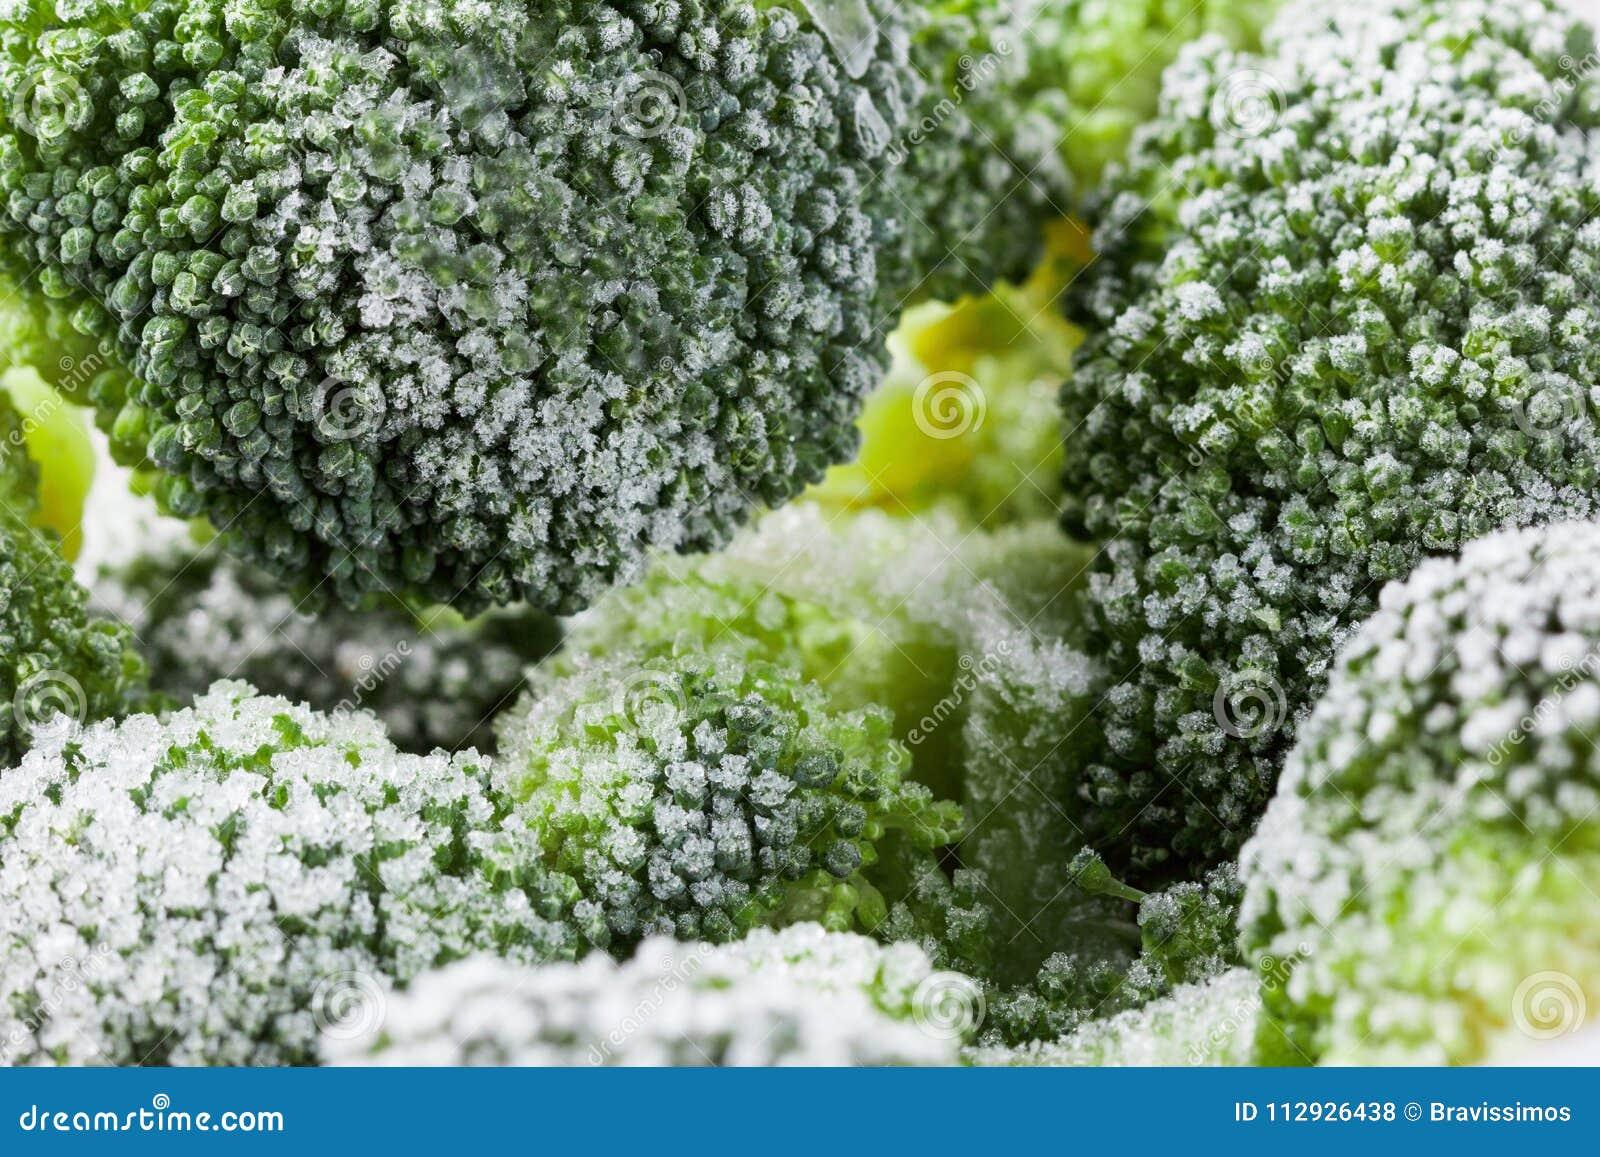 Fondo sano vegetal de la comida Vitaminas congeladas bróculi